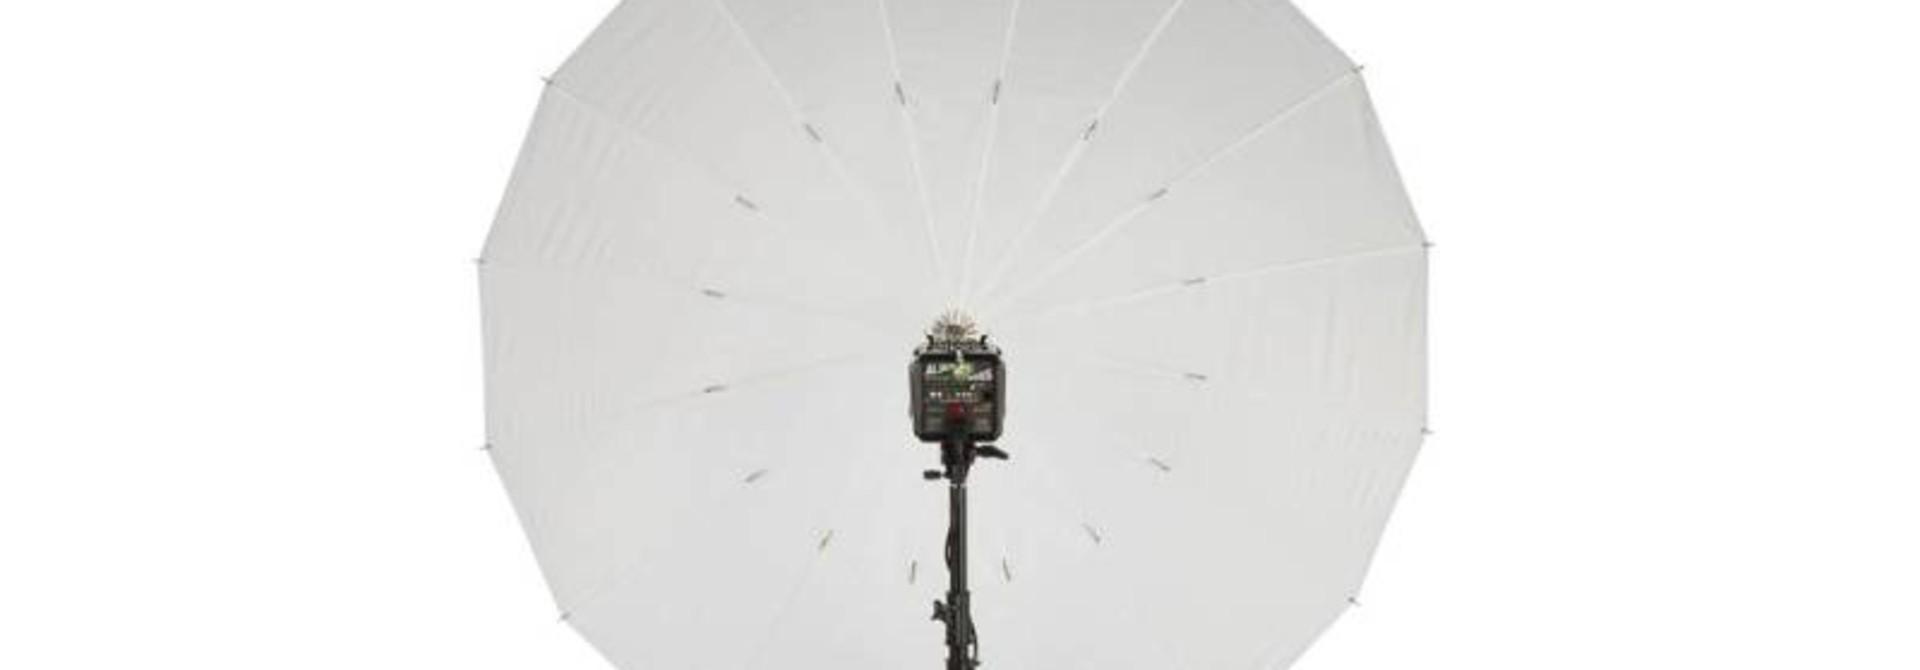 "51"" White PLM Umbrella"